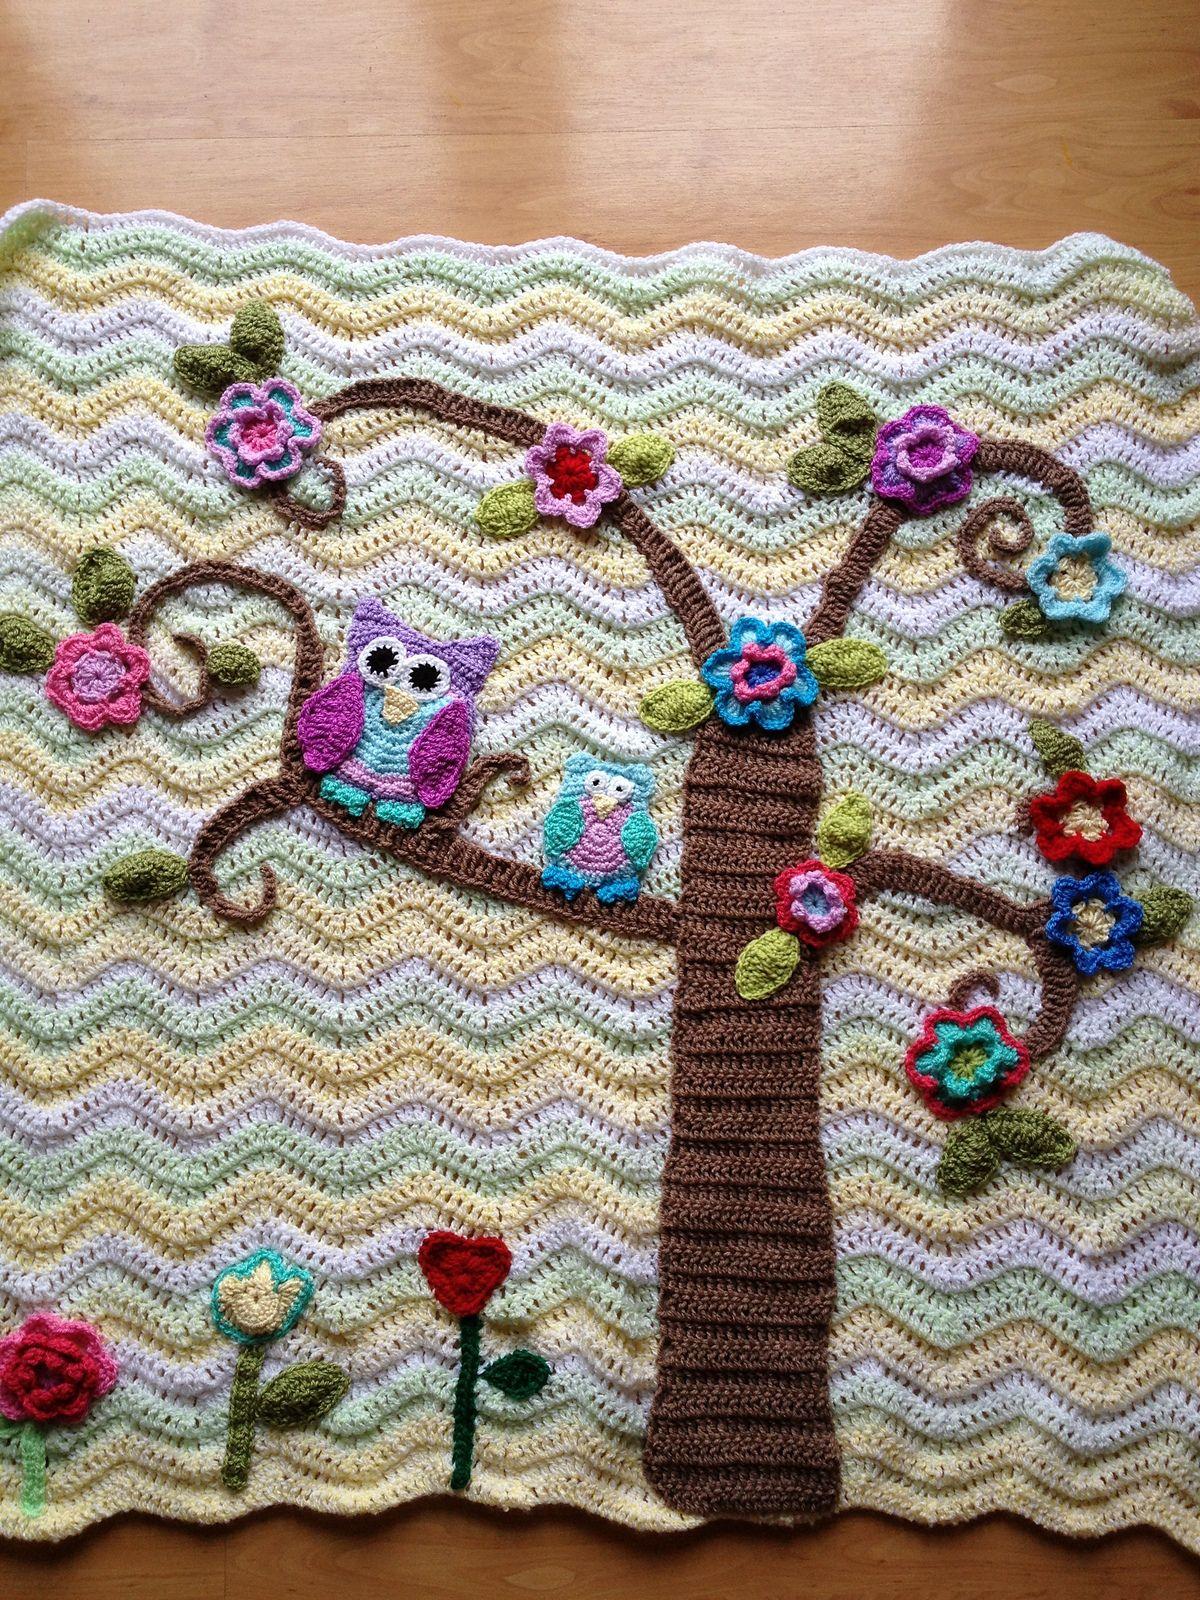 Ravelry flossys nursery owls pt2 the revenge teresa restegui crochet nursery owls ripple pattern blanket with free pattern bankloansurffo Image collections